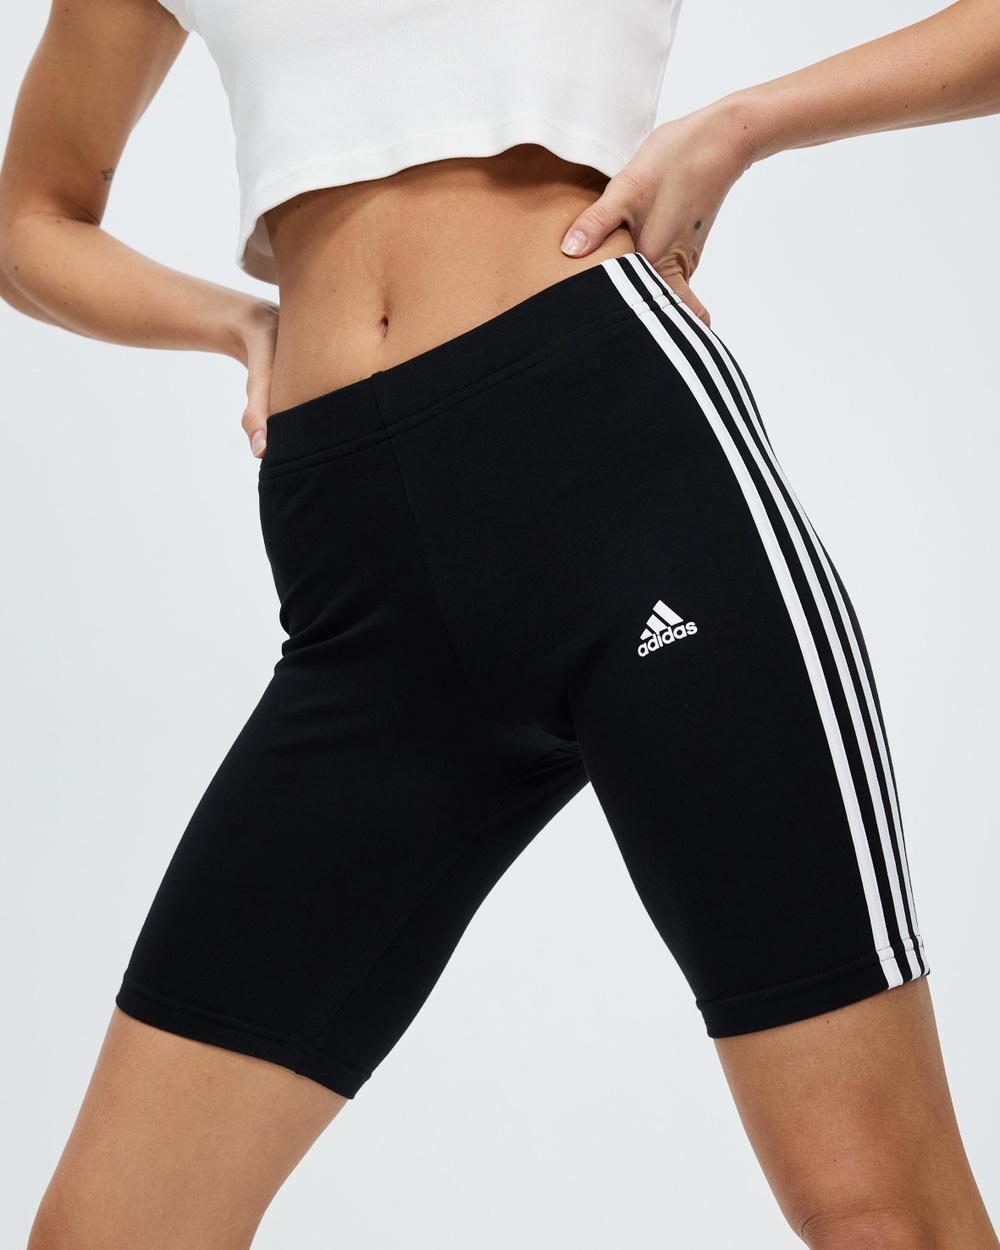 adidas Performance 3 Stripes Bike Shorts 1/2 Tights Black & White 3-Stripes